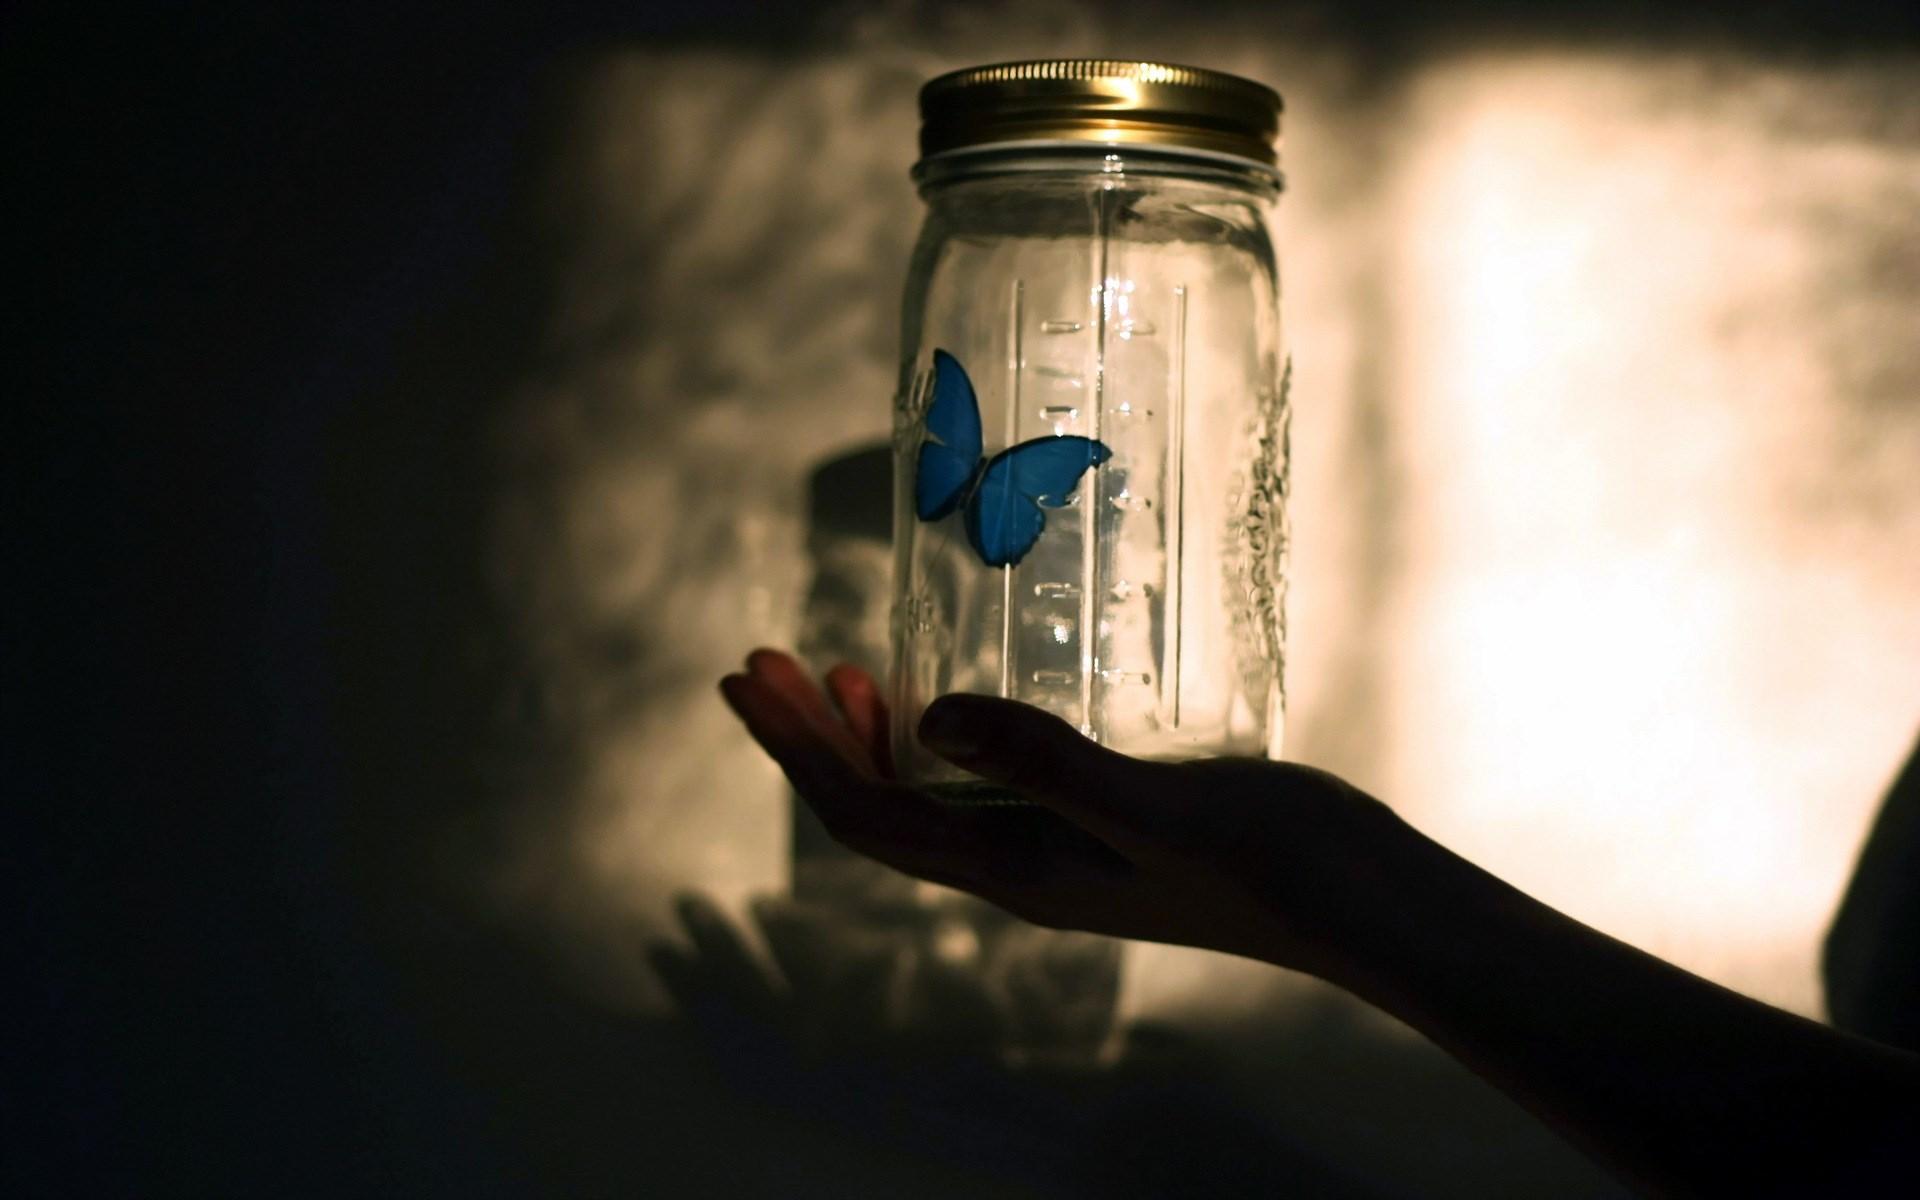 Love Jar Wallpaper : Blue Butterfly Jar Wallpaper 49805 1920x1200 px ...